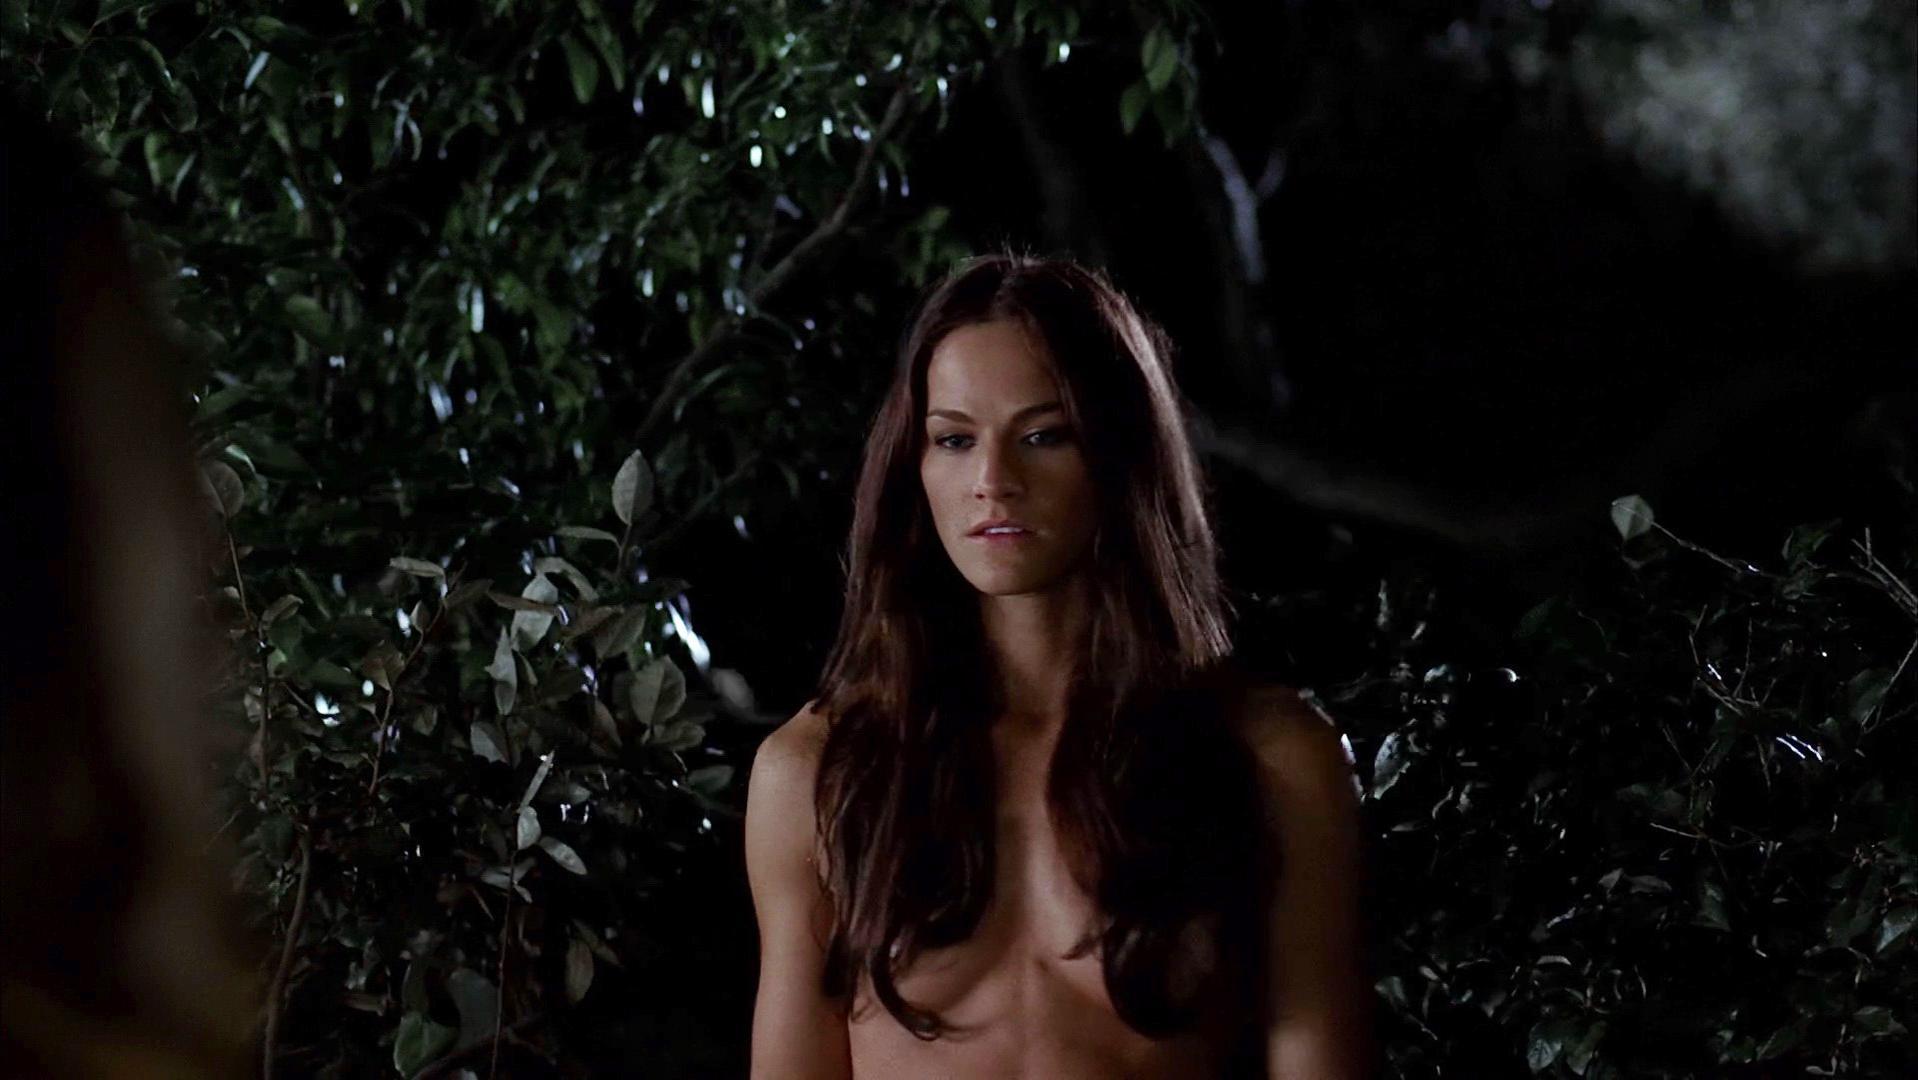 Kelly overton naked nude